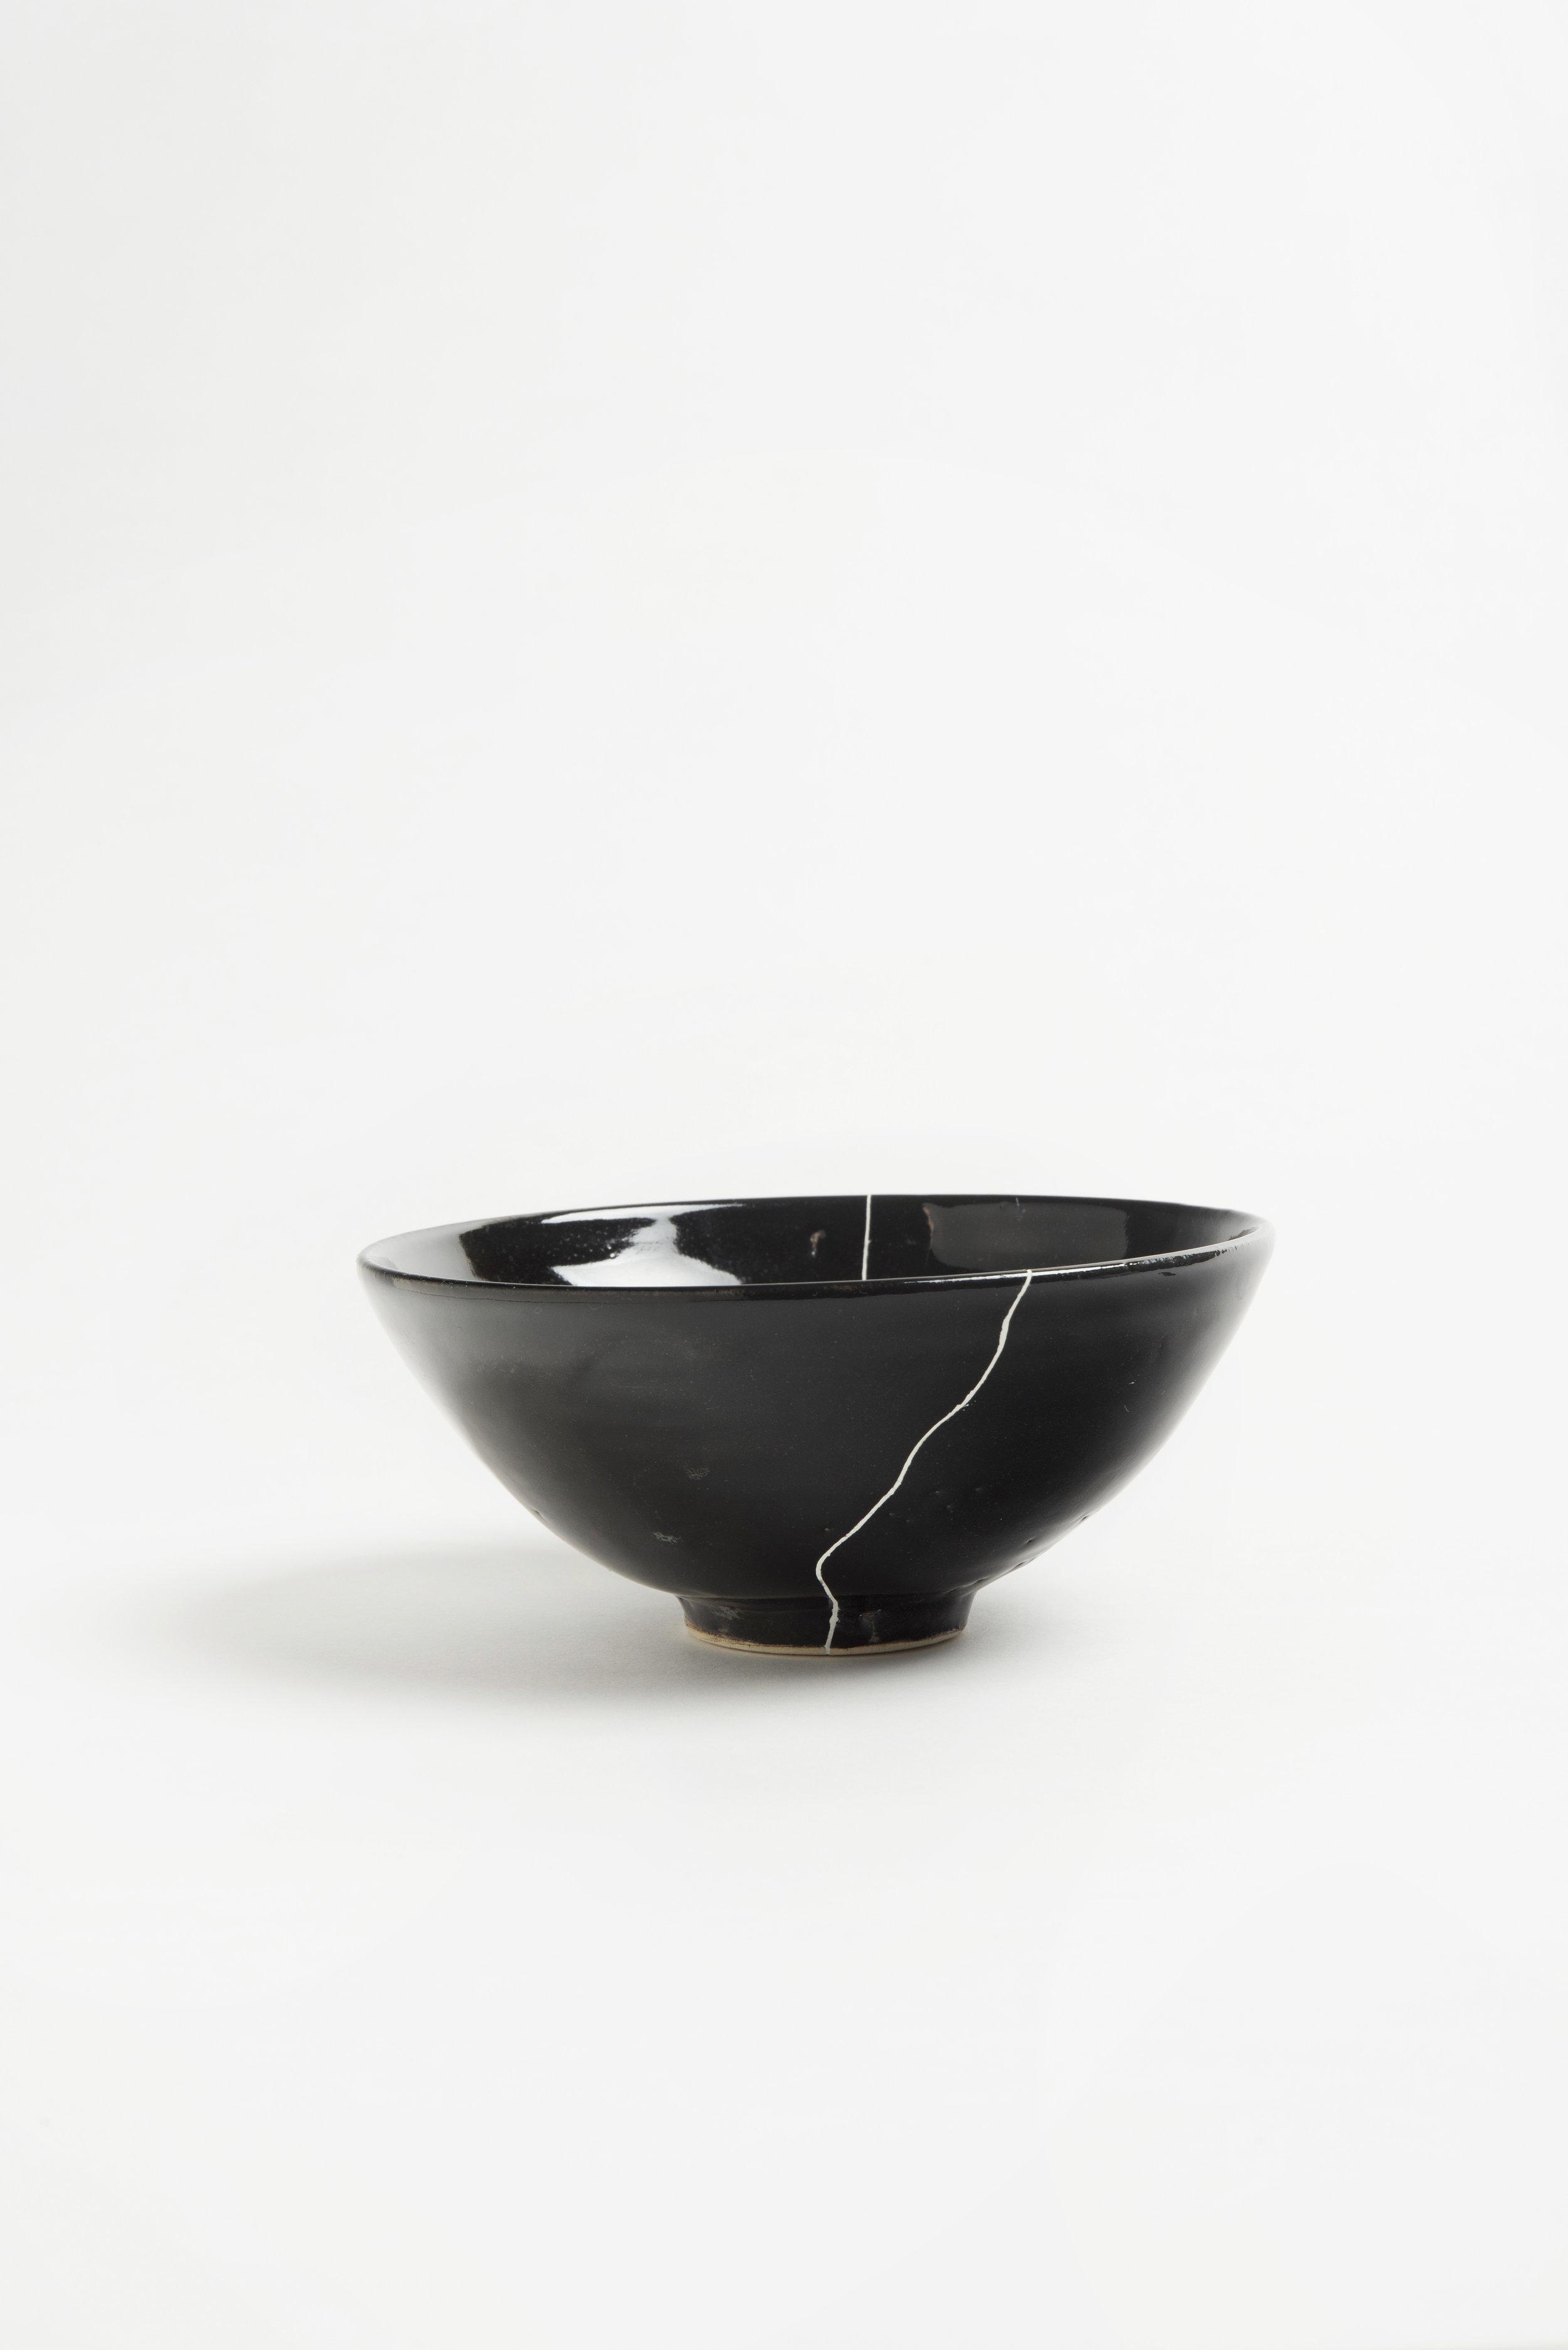 black-fracture-series-bowl-romy-northover-ceramics-the-garnered-42.jpg